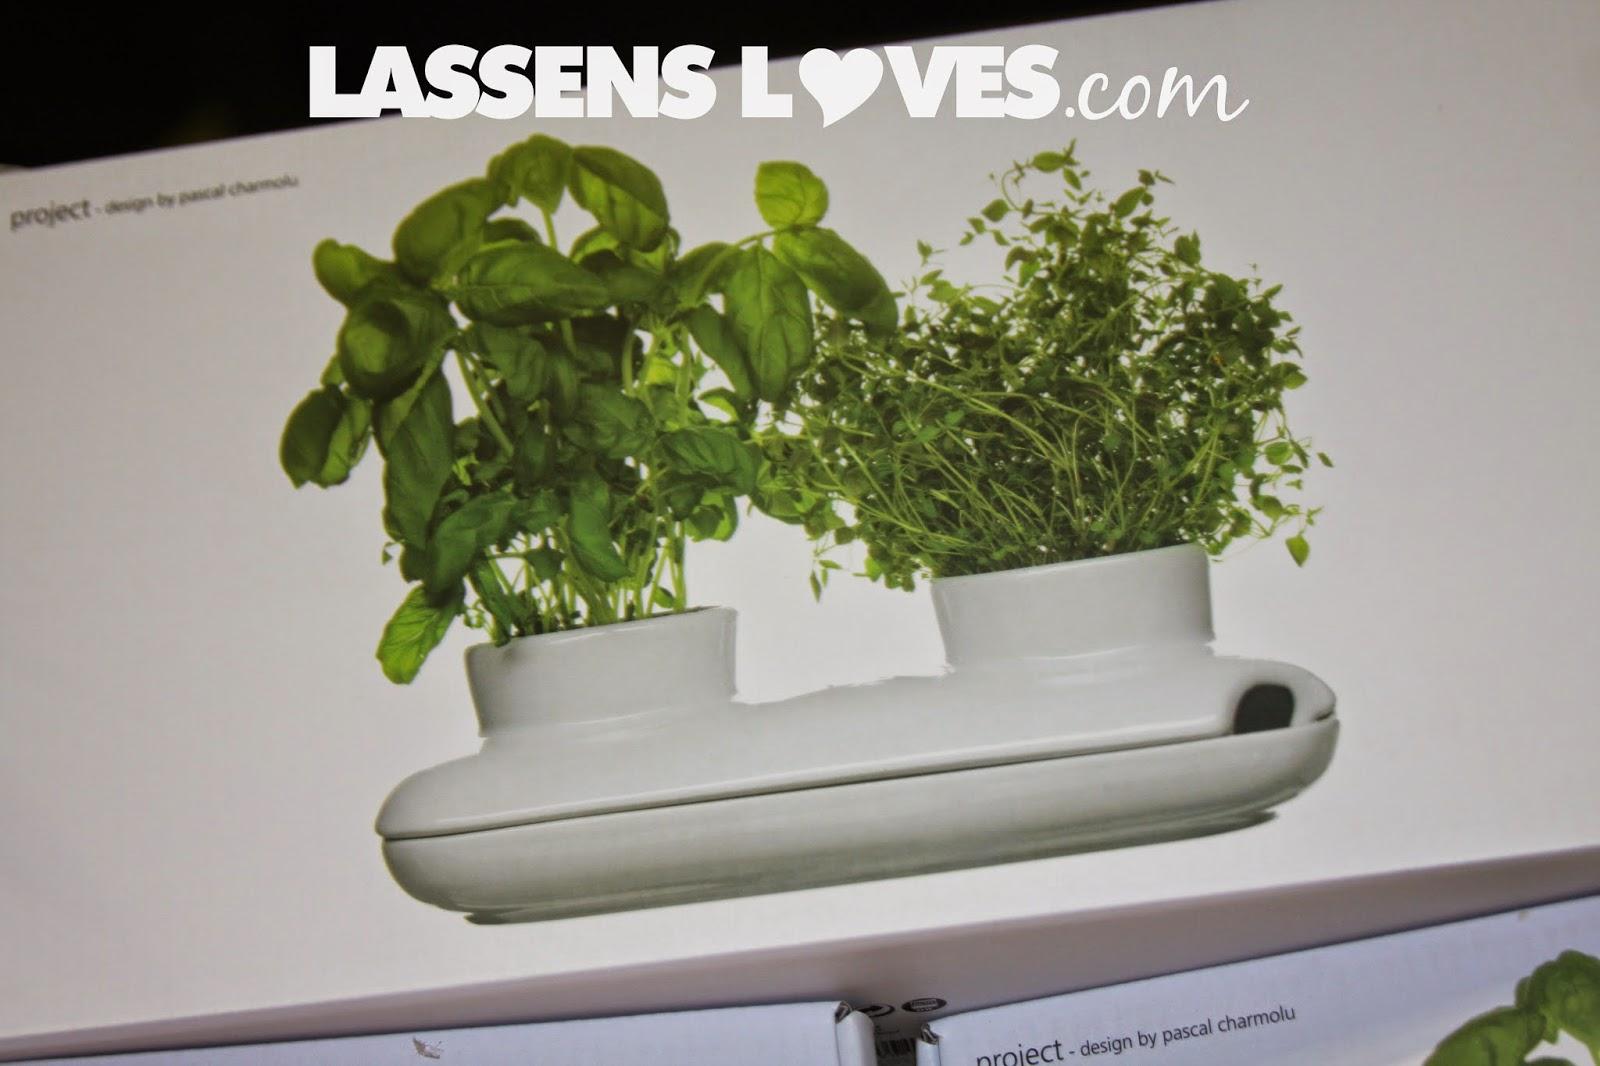 gift+ideas, indoor+gardens, kitchen+gardens, growing+kits